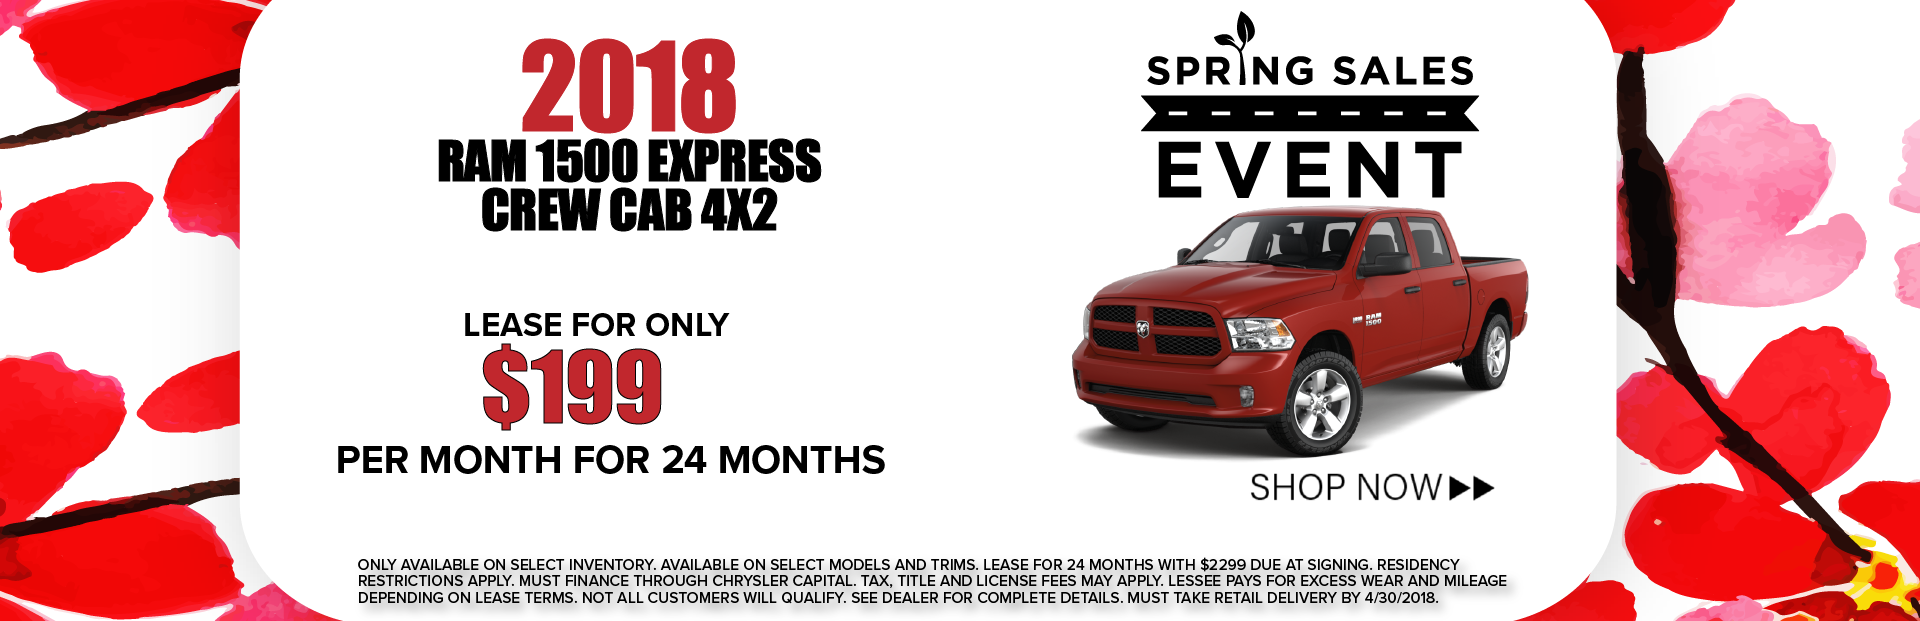 2018 Ram 1500 Express Crew Cab 4X2 Spring Sales Event Banner